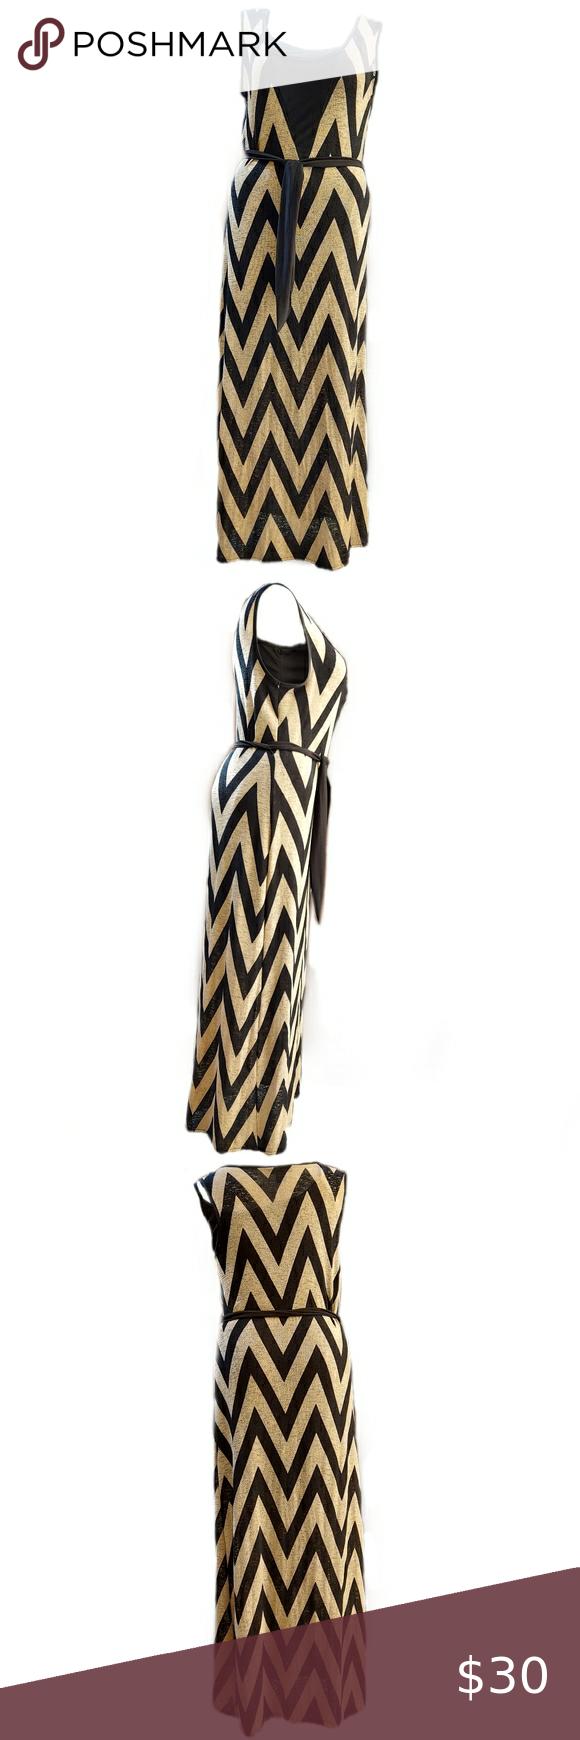 Ashley Stewart Black Taupe Zigzag Maxi Dress Dress Size Chart Women Plus Size Maxi Dresses Yellow Maxi Dress [ 1740 x 580 Pixel ]